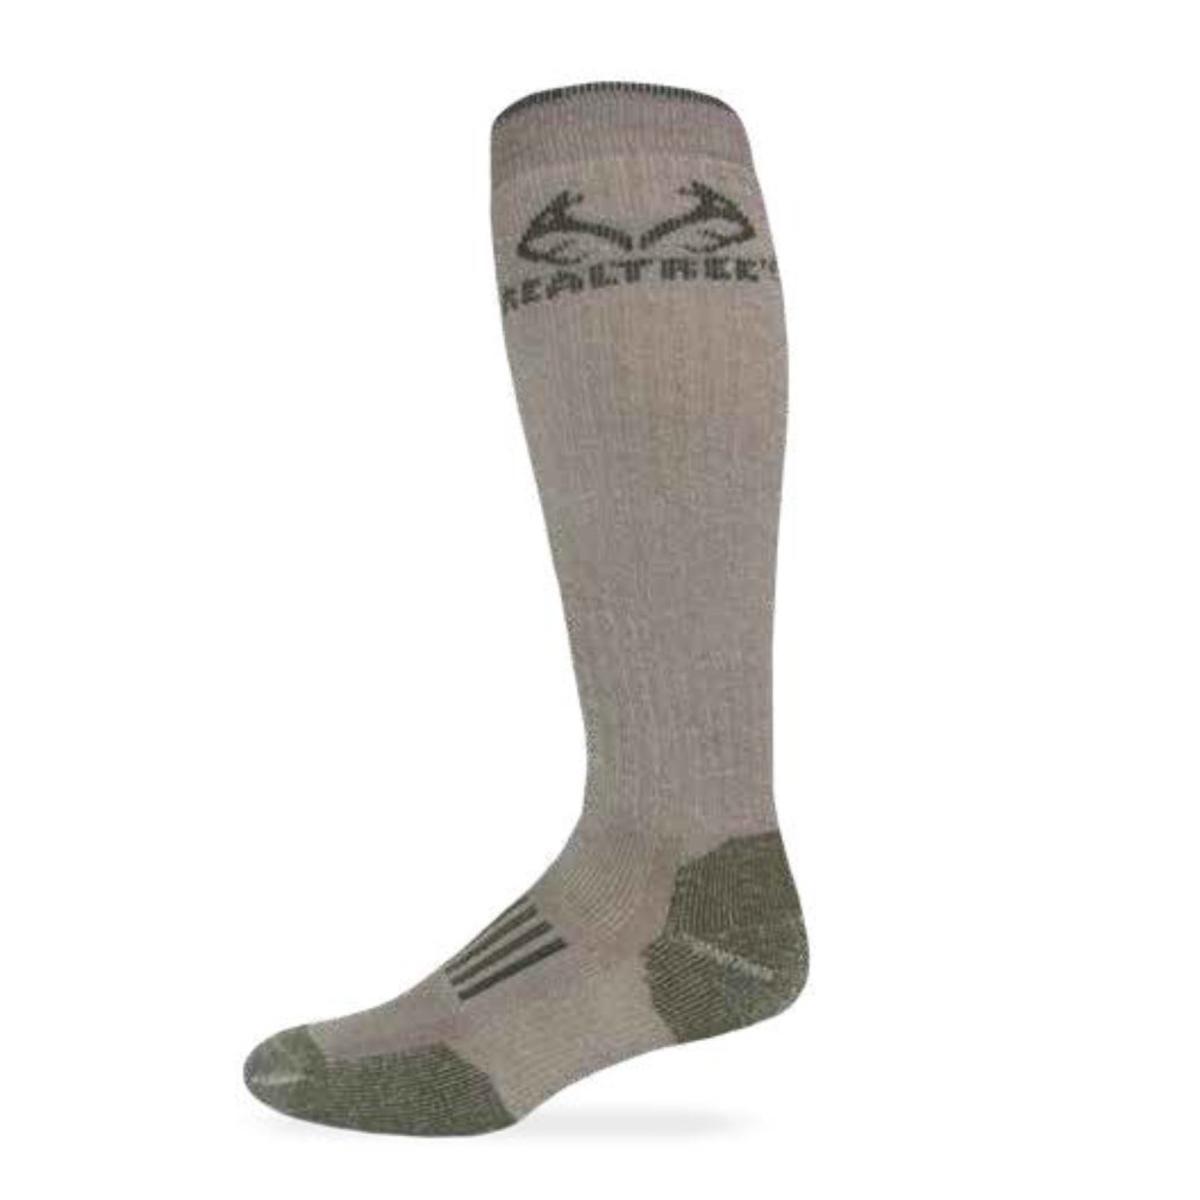 Details about RealTree 9806 Heavyweight Merino Wool Tall All Season Boot  Socks 54107c6bc8a